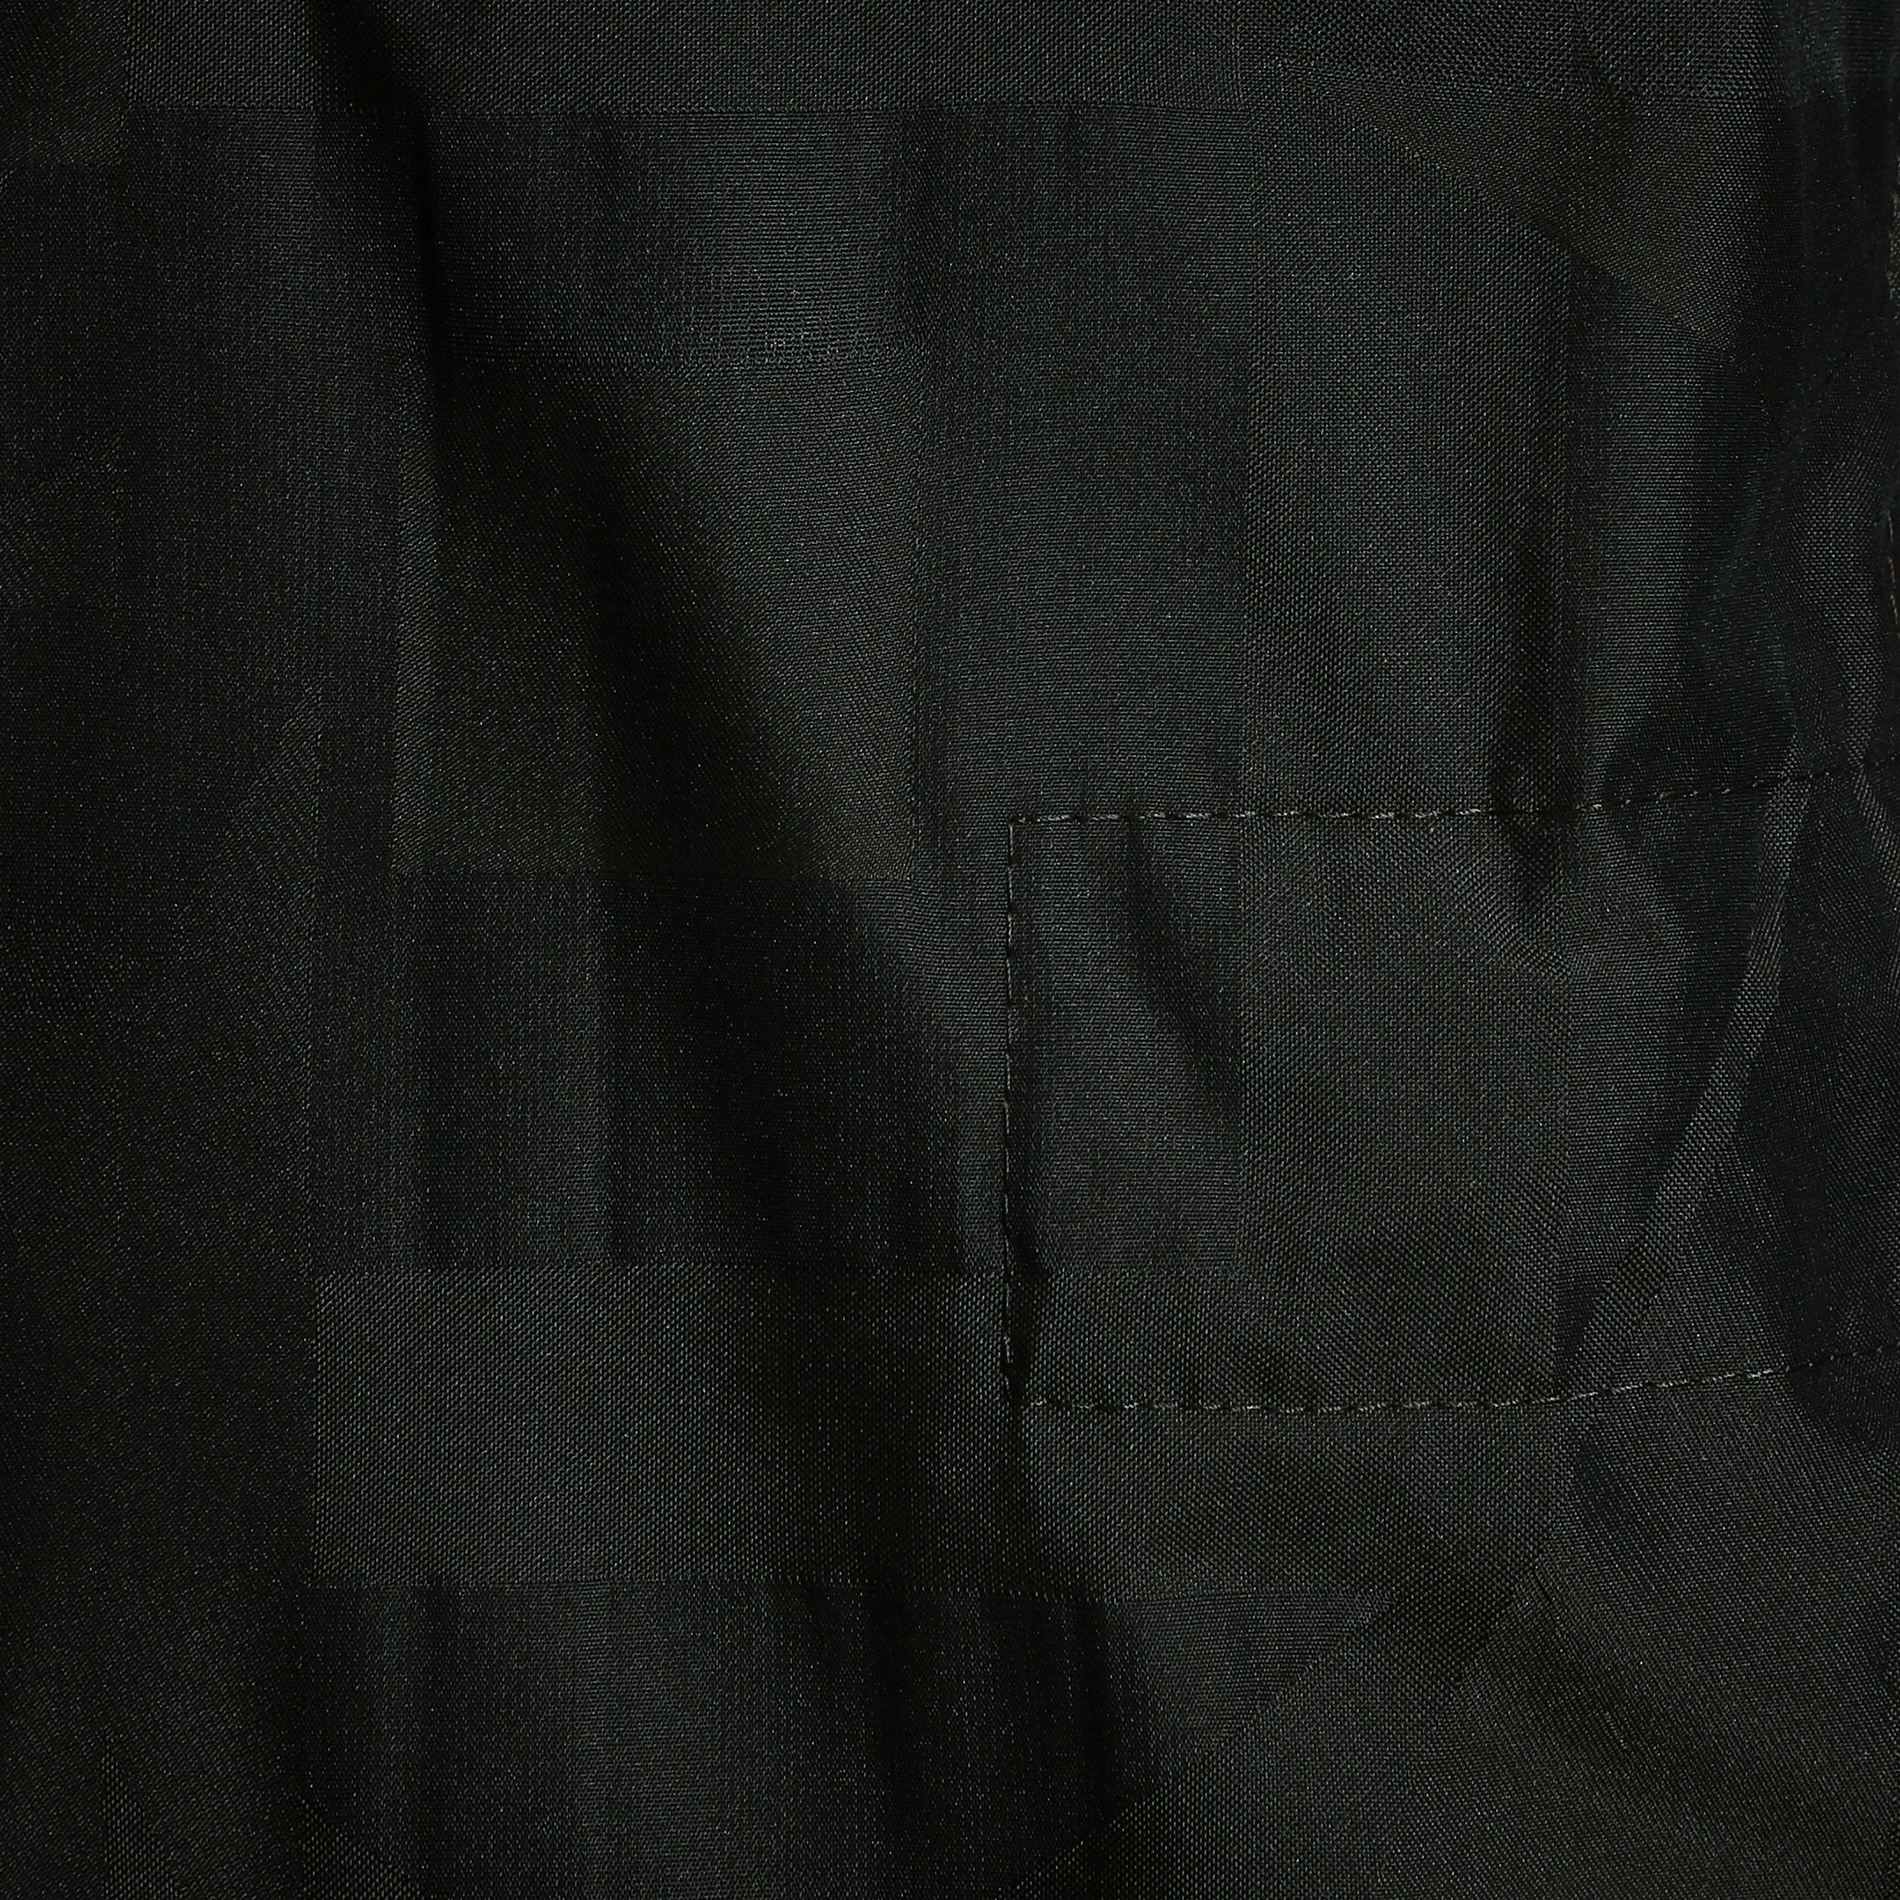 【BERWICK】アンドリューカモフラージュジャガードパーカー